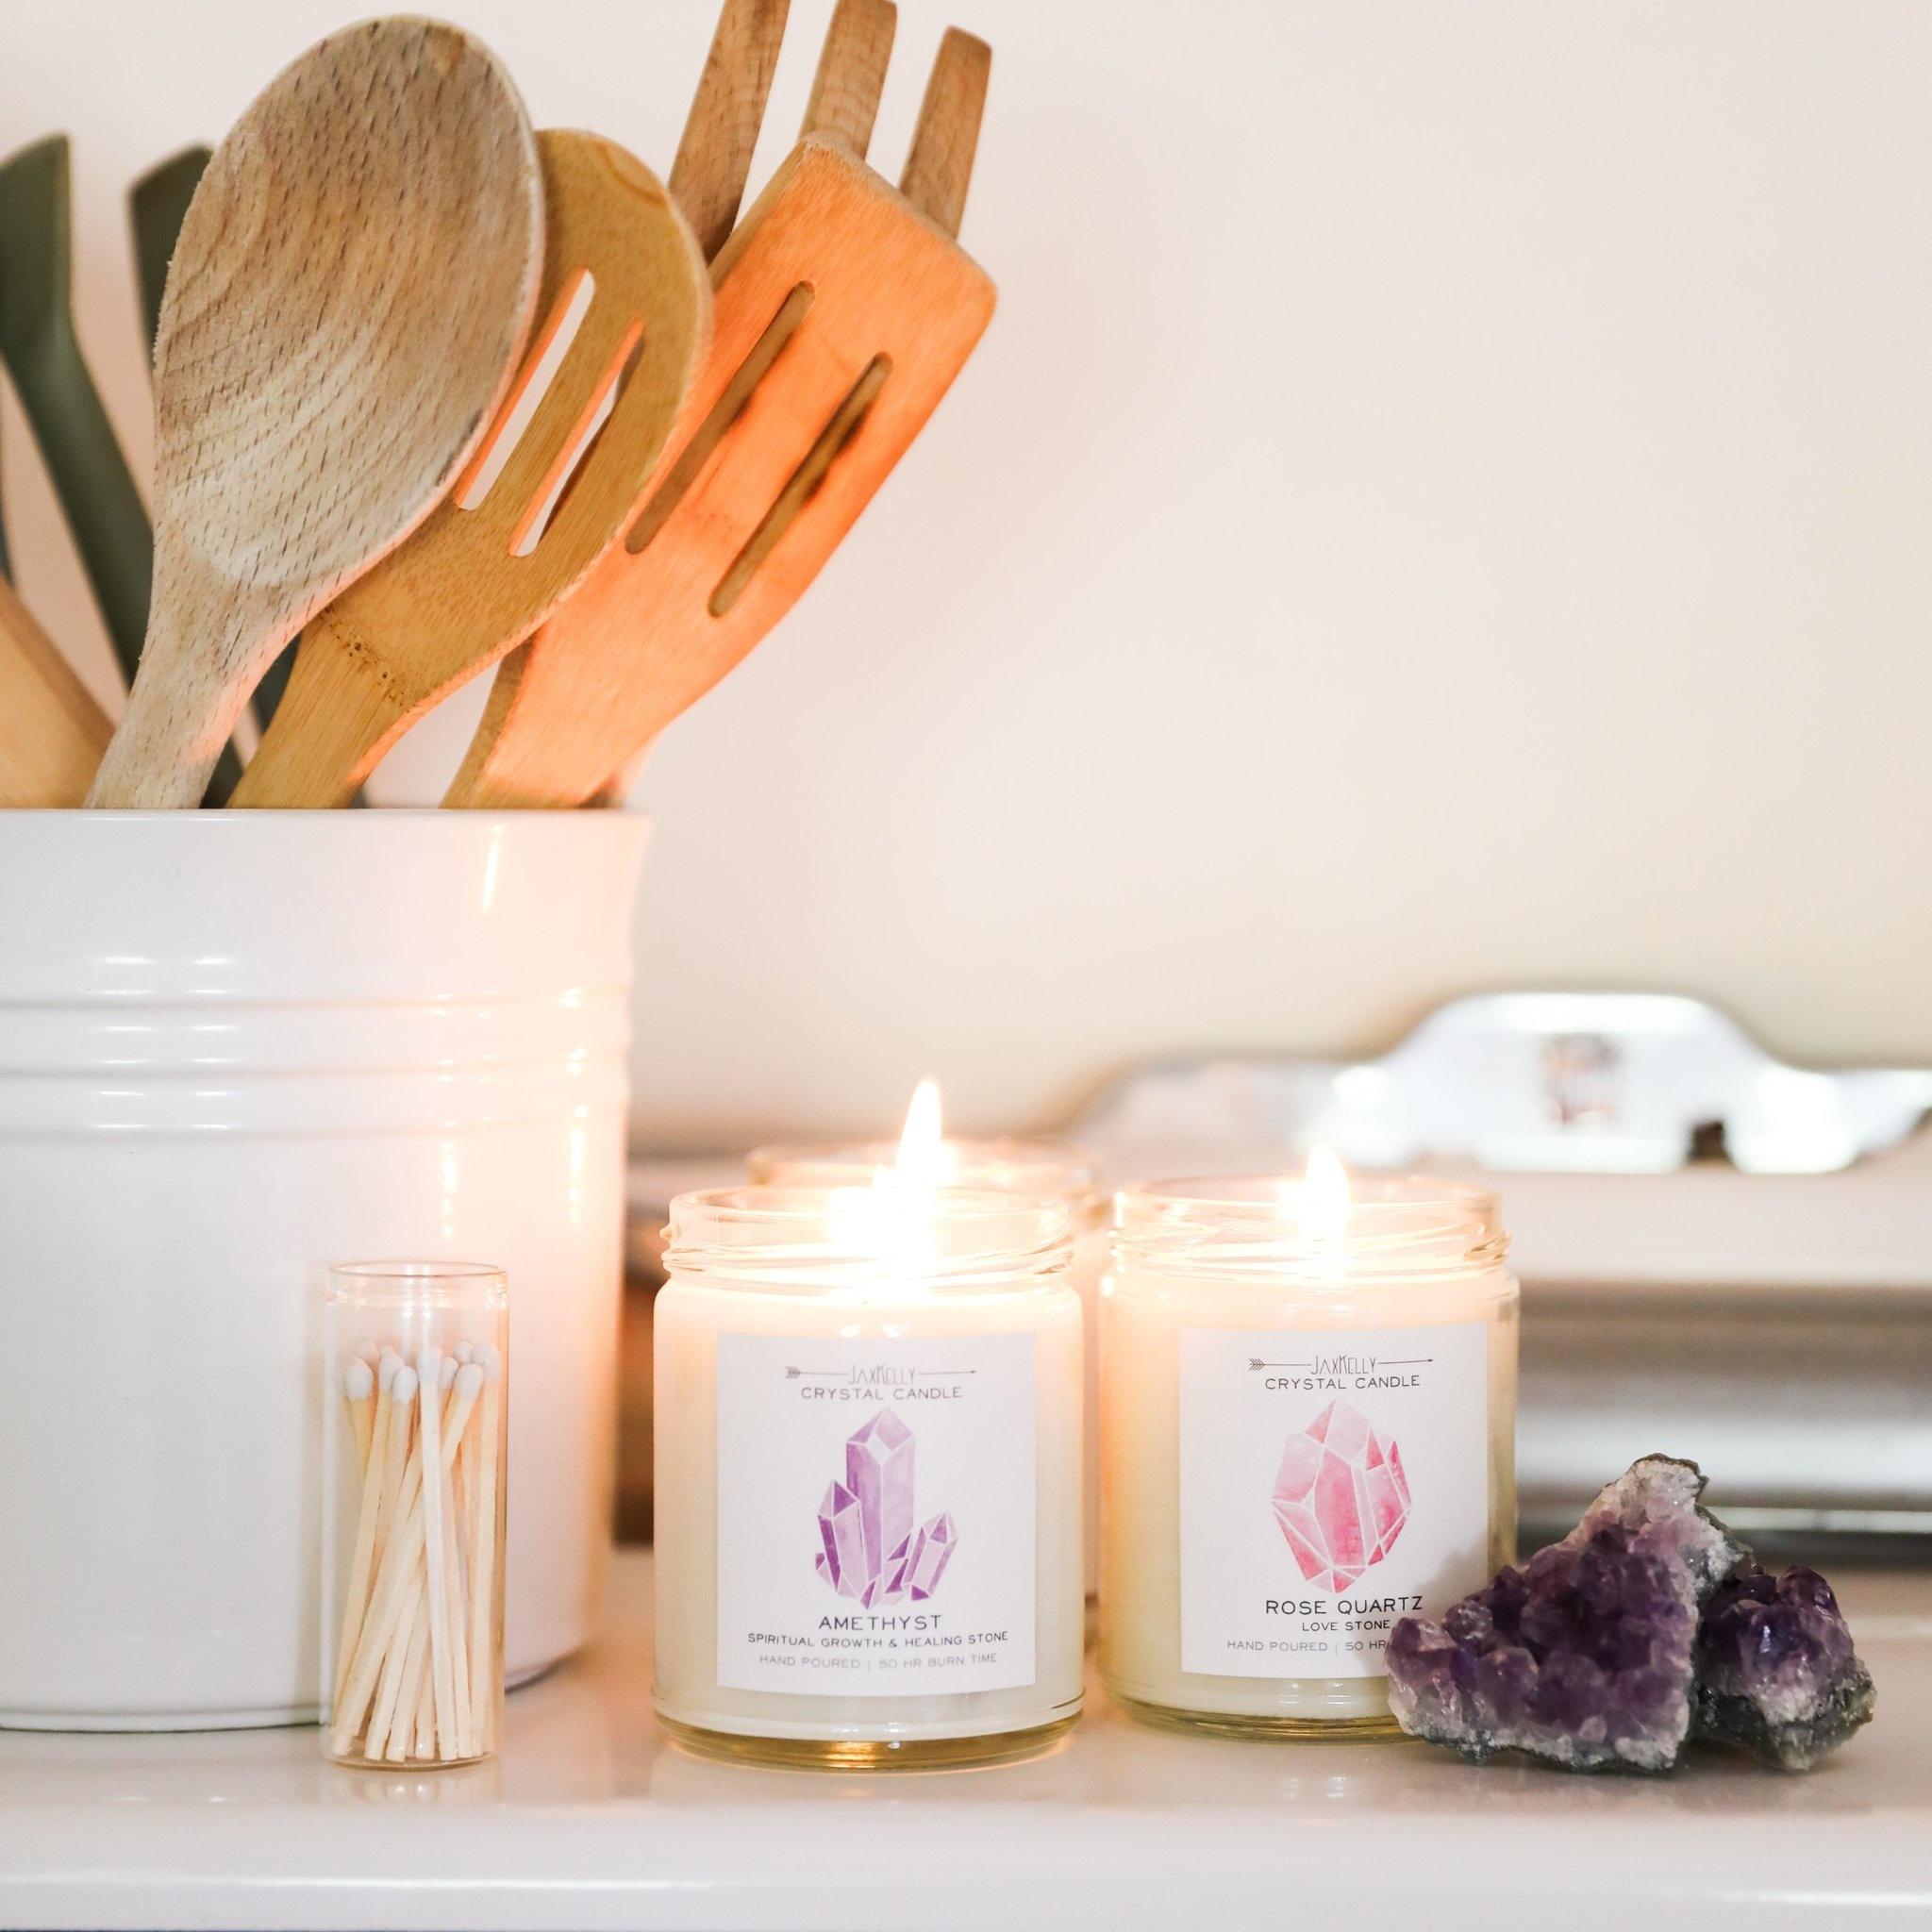 Rose Quartz Crystal Candle - Love